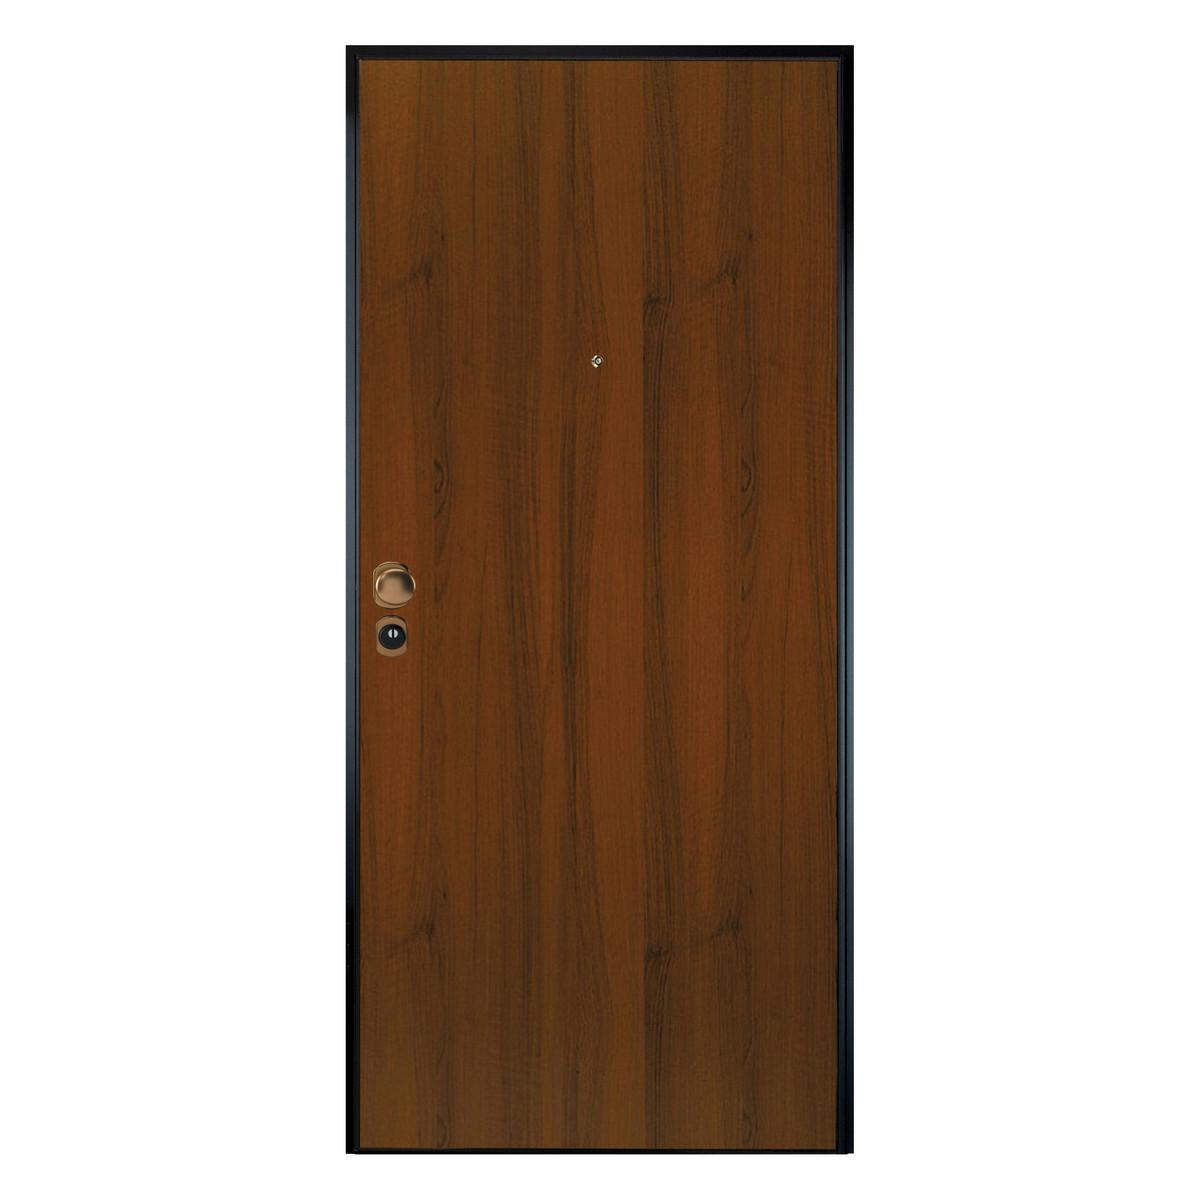 Porta alma blindata 90x210 sx prezzo e offerte sottocosto for Porte 63 cm leroy merlin